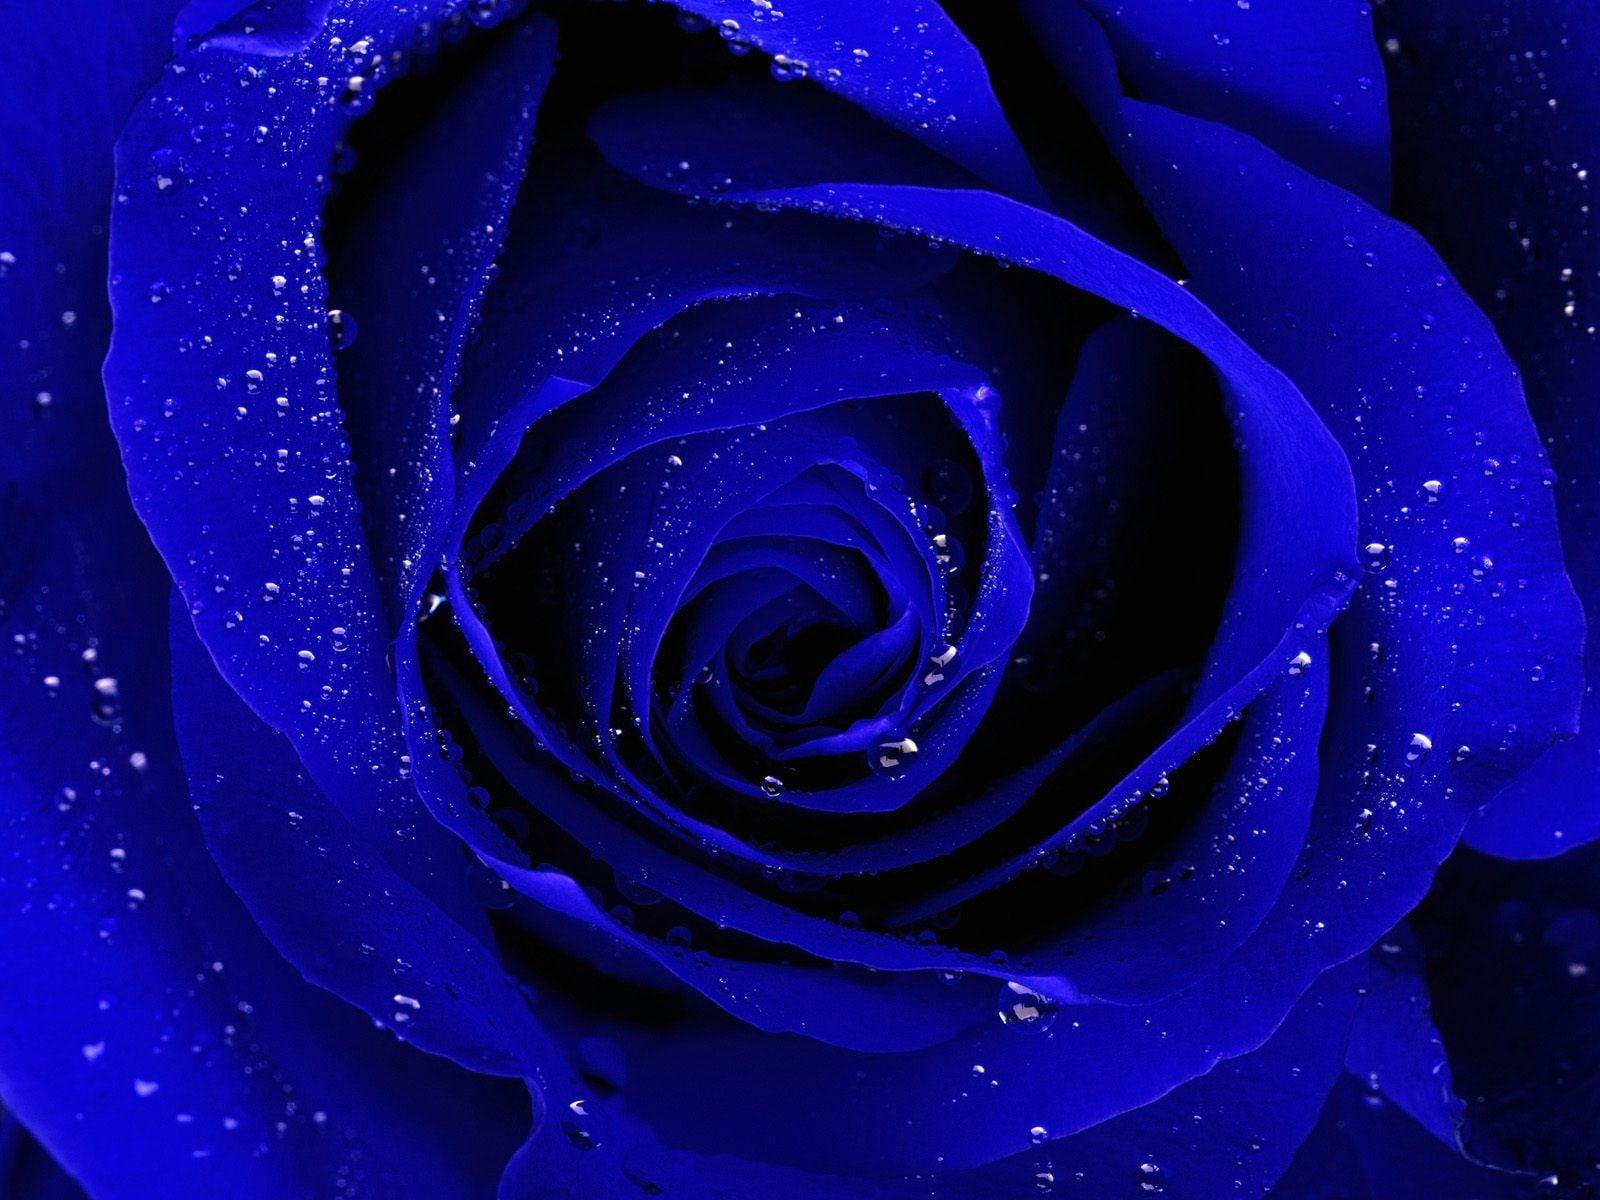 Blue Rose Background Wallpapers Christmas Wywhau Christmasonline2020 Site